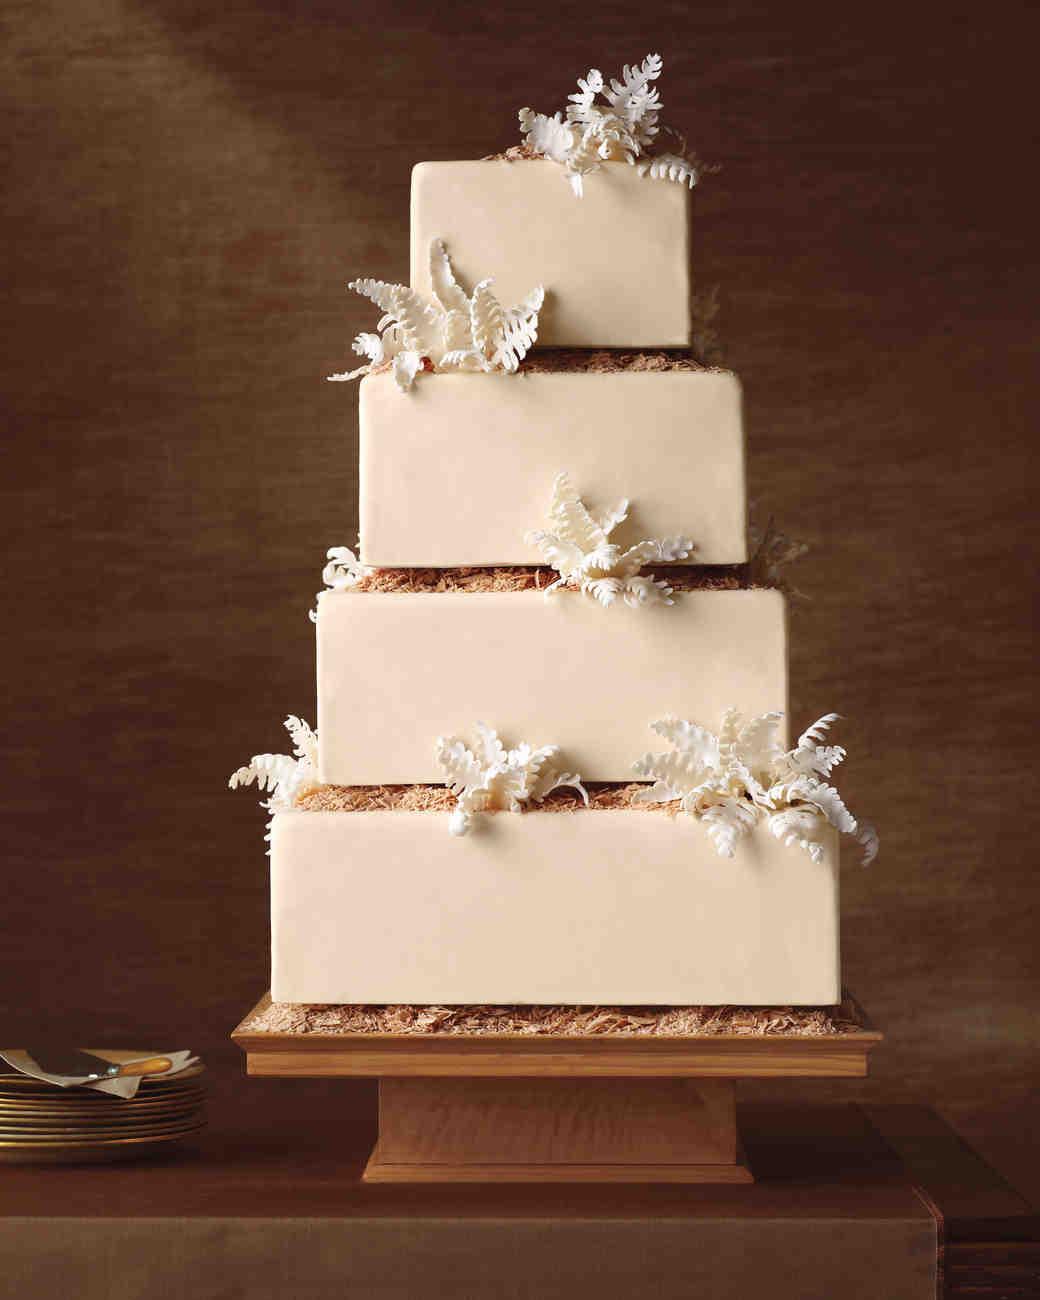 cake01-07-mwd109851.jpg